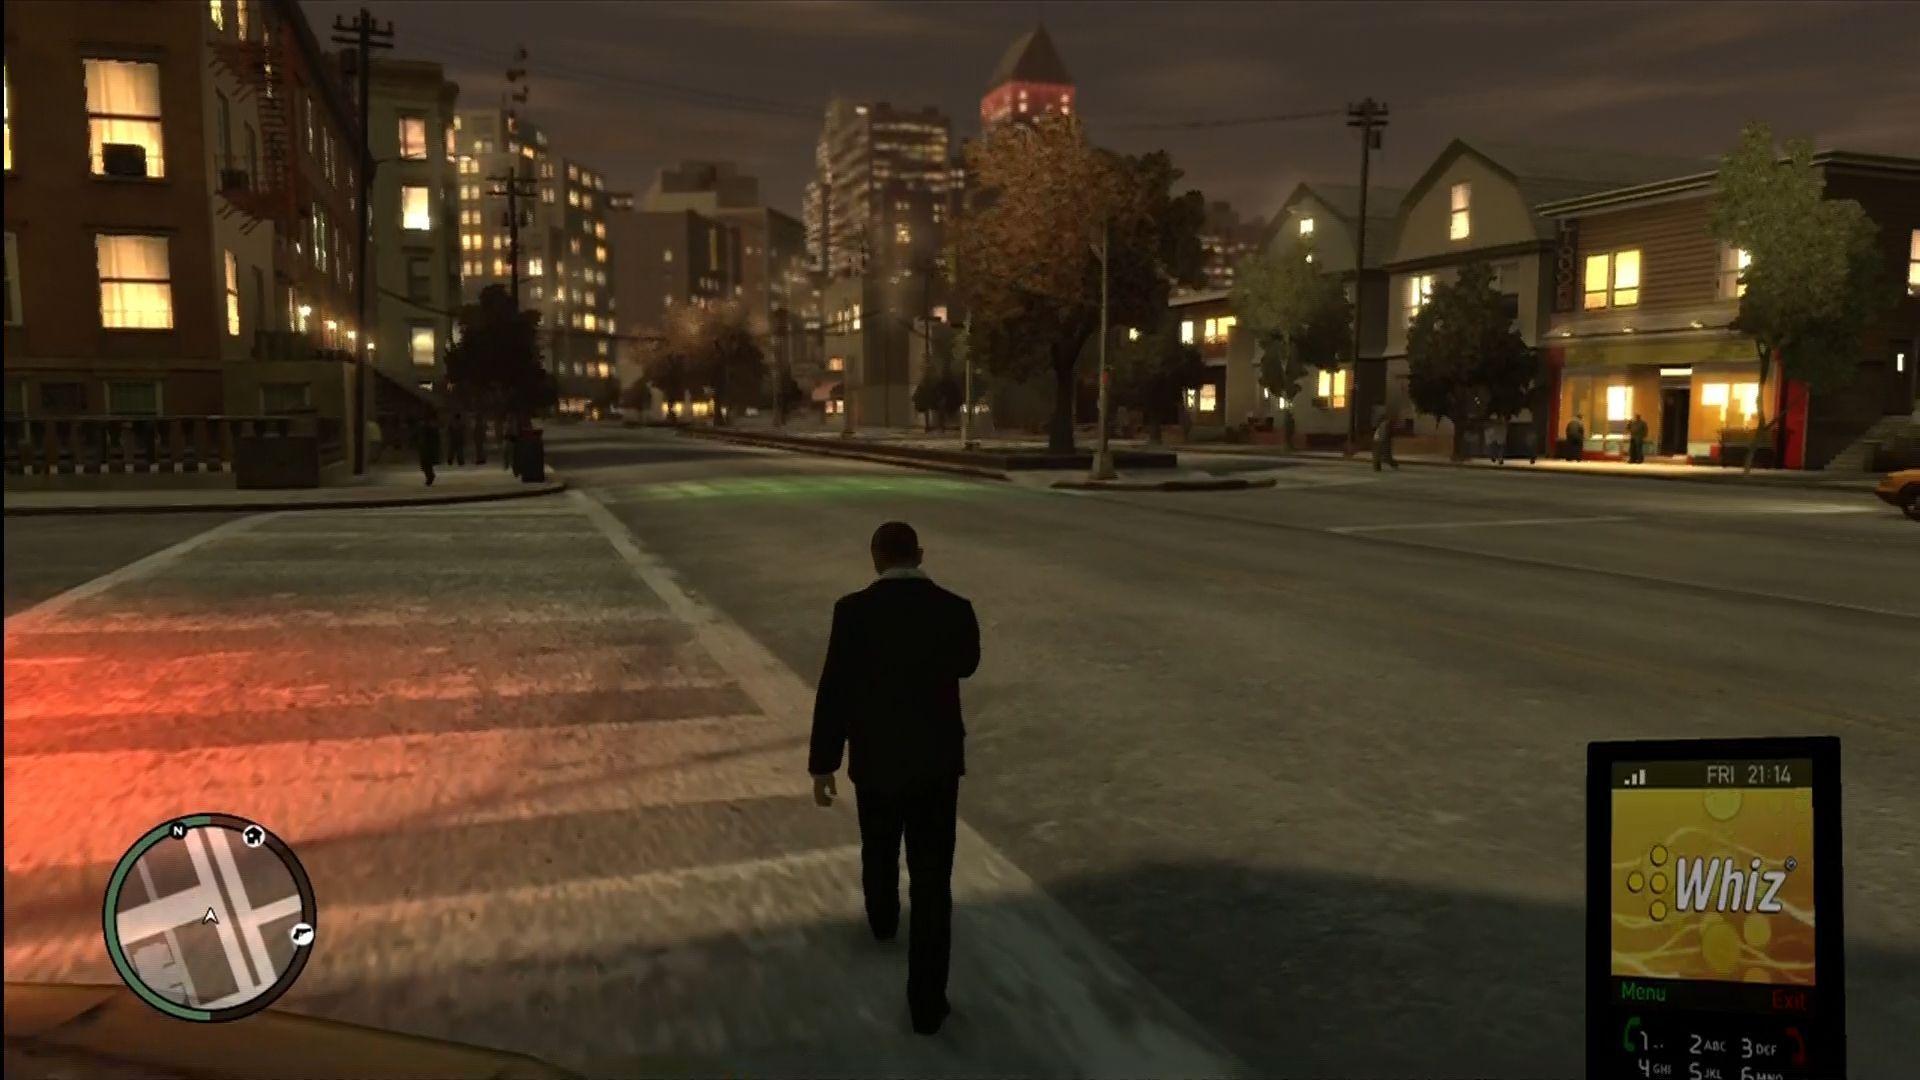 GTA 4 #gta4 #gtaiv #grantheatfauto #openworldgames | Microsoft, Shutter  island, Grand theft auto 4